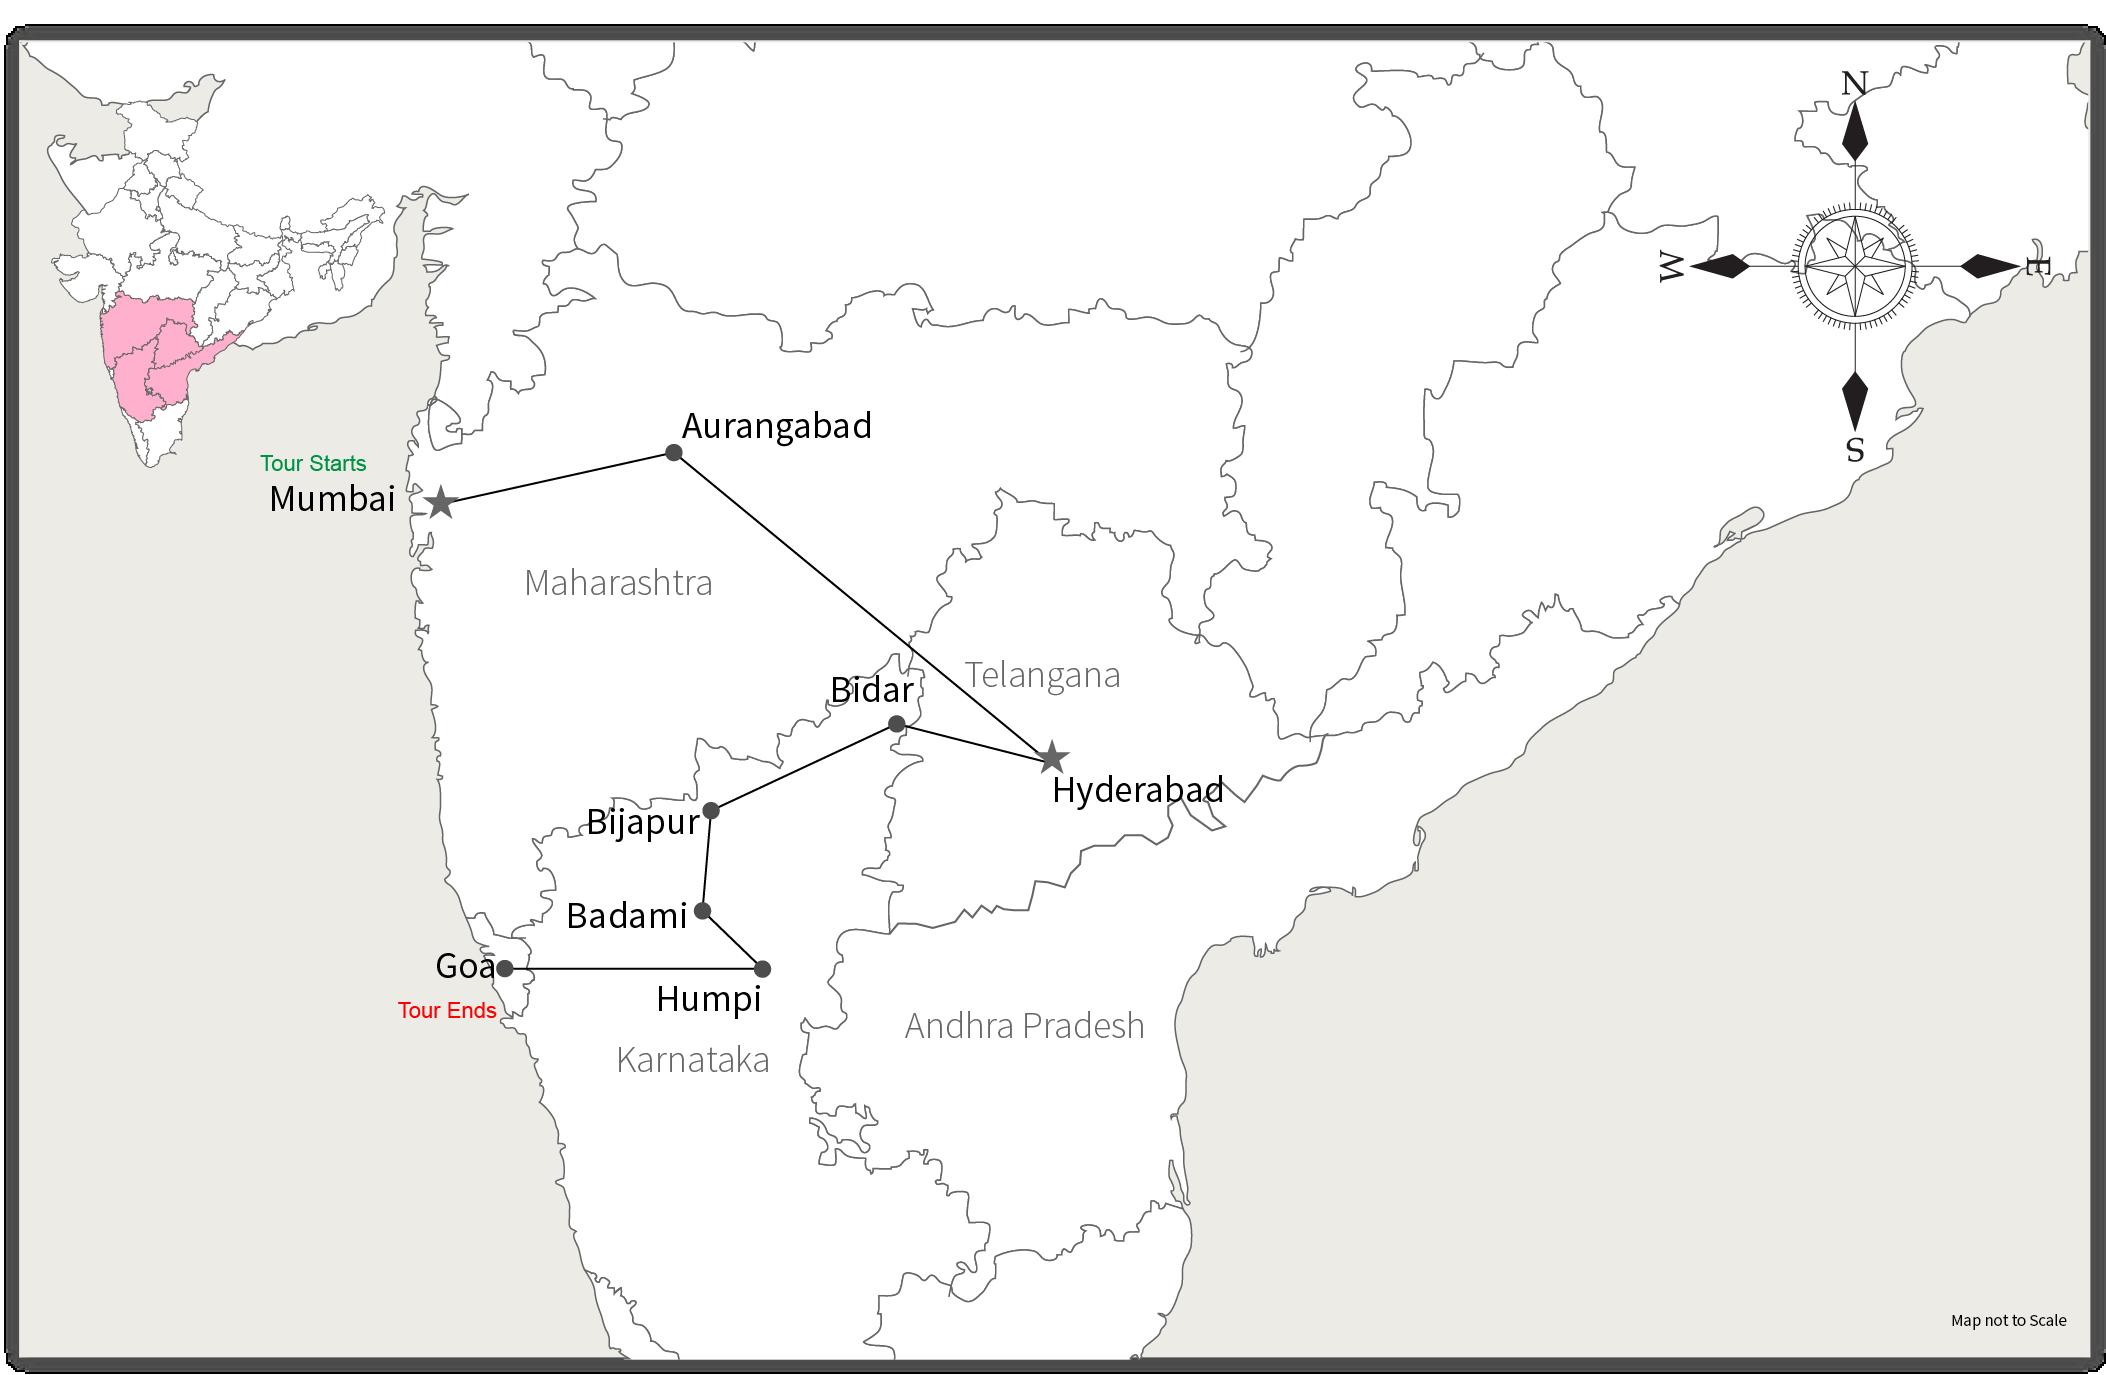 Indian Moments on manchurian plain map, brahmaputra river map, bhander plateau, great indian desert map, tibetan plateau, india map, tibet map, himalayan mountains map, narmada river map, mysore plateau, kashmir map, arabian sea map, khyber pass map, thar desert map, patna map, harappa map, chota nagpur plateau, laccadive sea map, hyderabad map, taklamakan desert map, gobi desert map, delhi map, satpura range map, nepal map, shah alam ii, states of india,